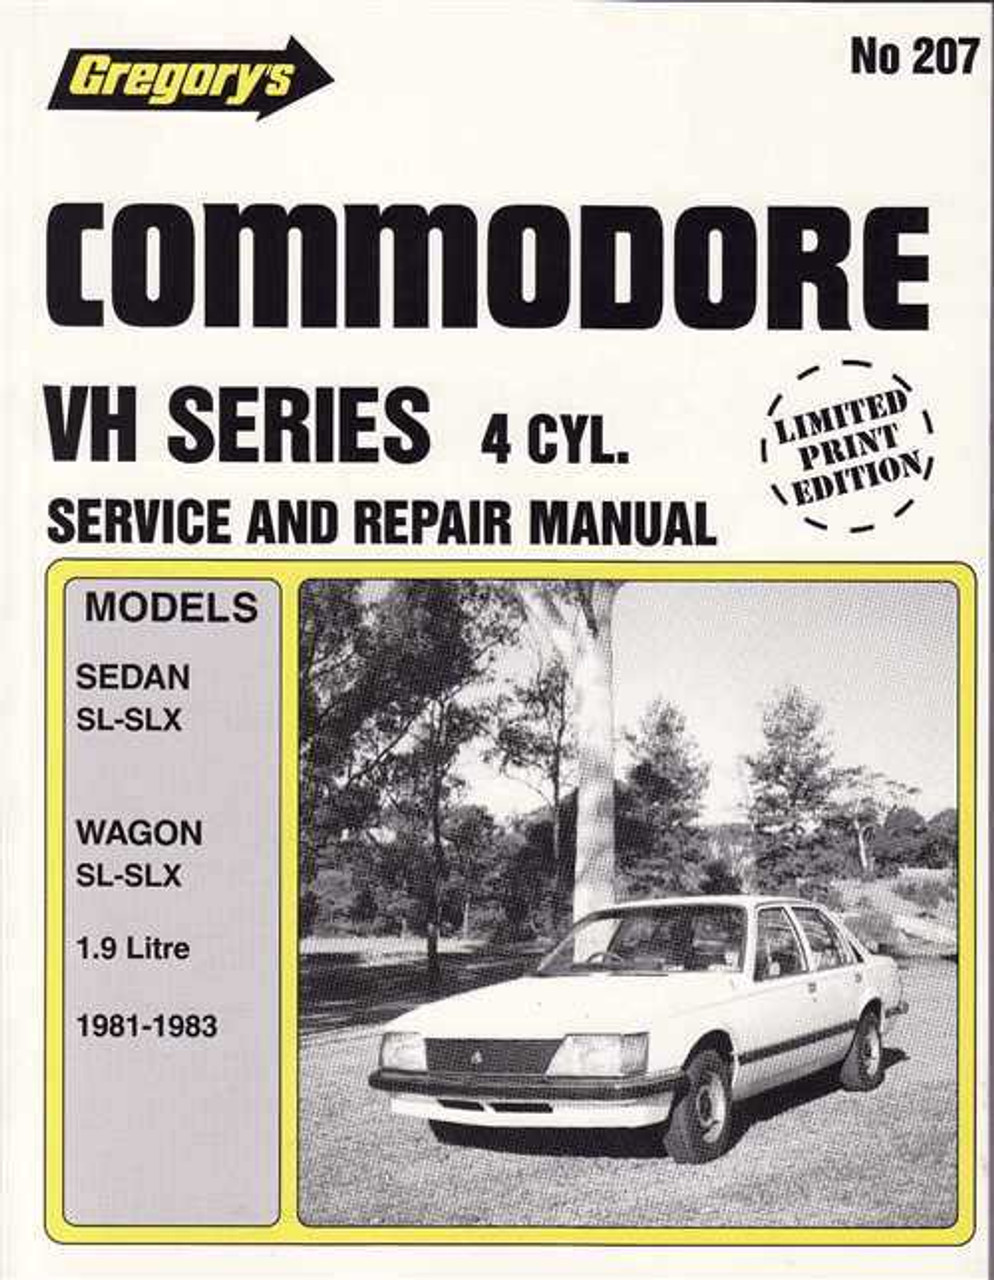 holden commodore vh series 4 cylinder 1981 1983 workshop manual rh automotobookshop com au vc commodore workshop manual free download vh commodore workshop manual free download